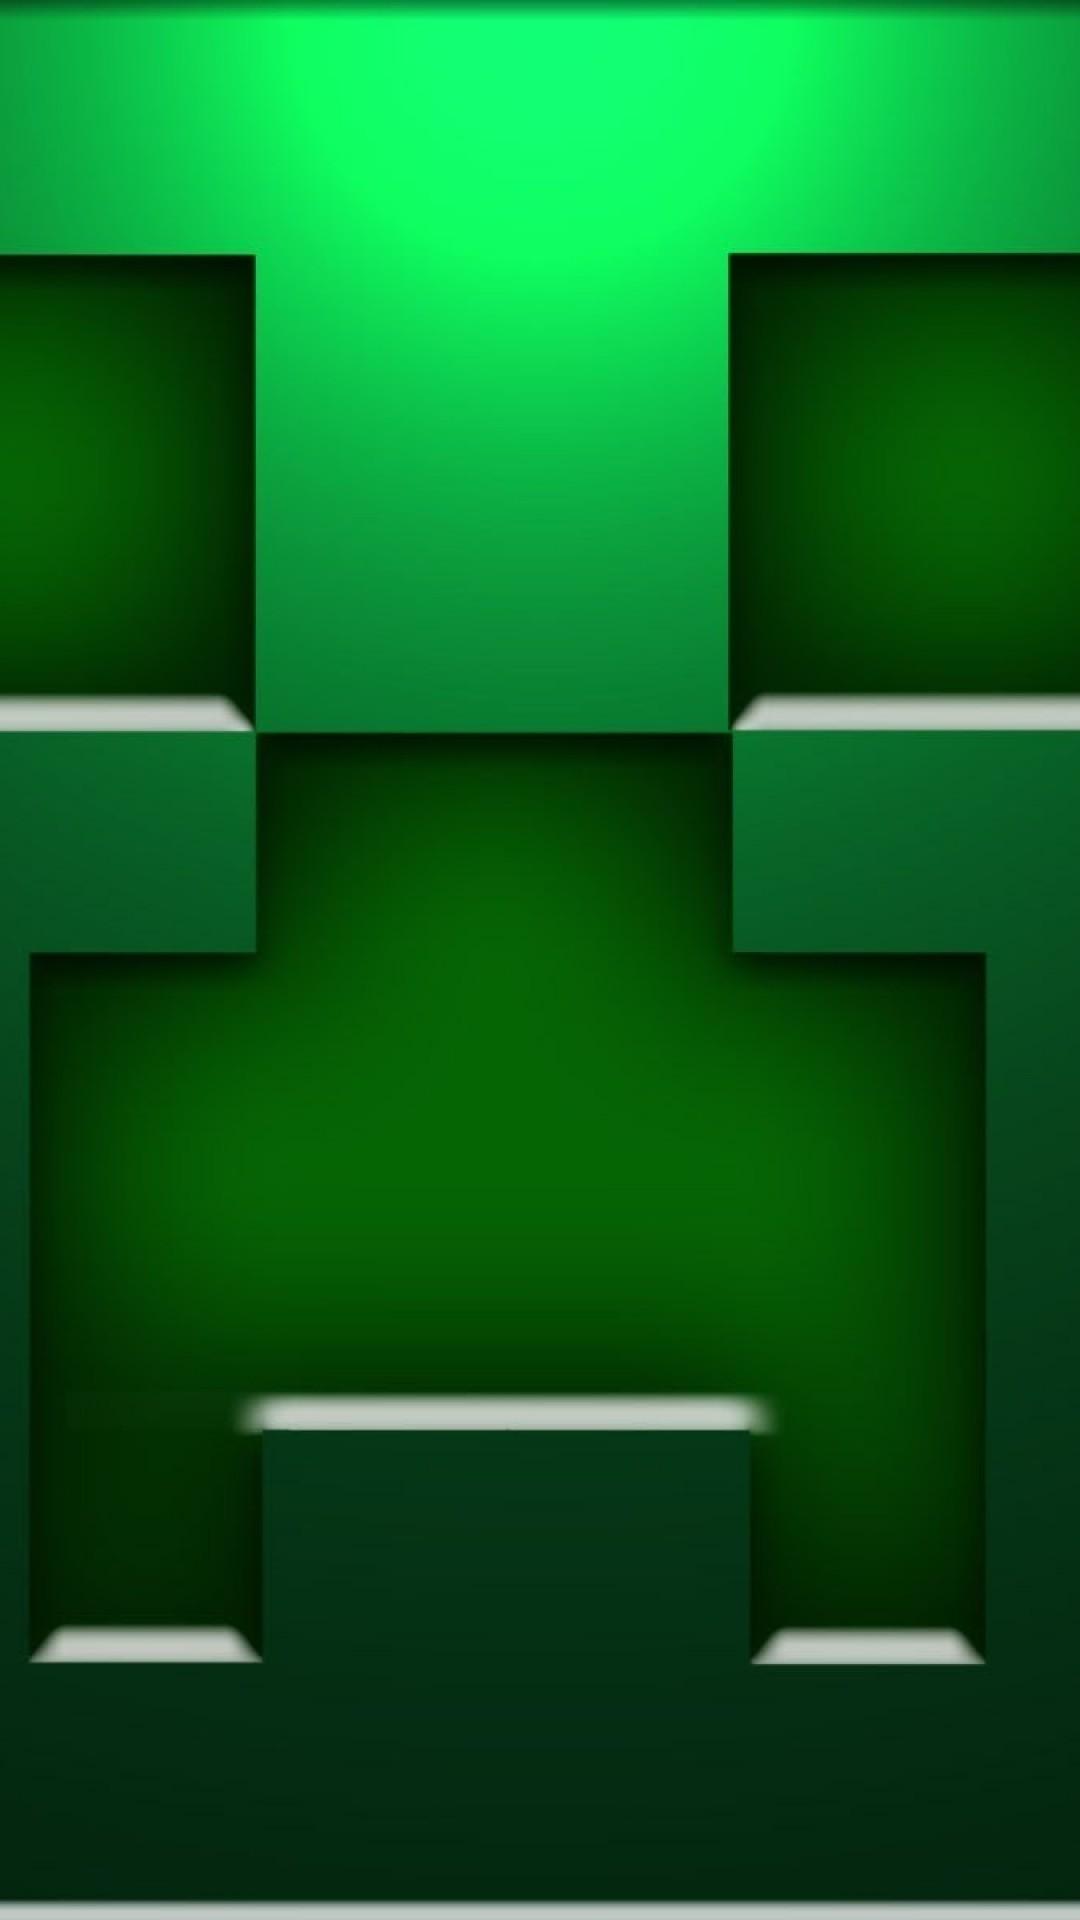 Fantastic Wallpaper Minecraft Phone - 1041931-best-minecraft-creeper-wallpaper-1080x1920  Collection_244862.jpg